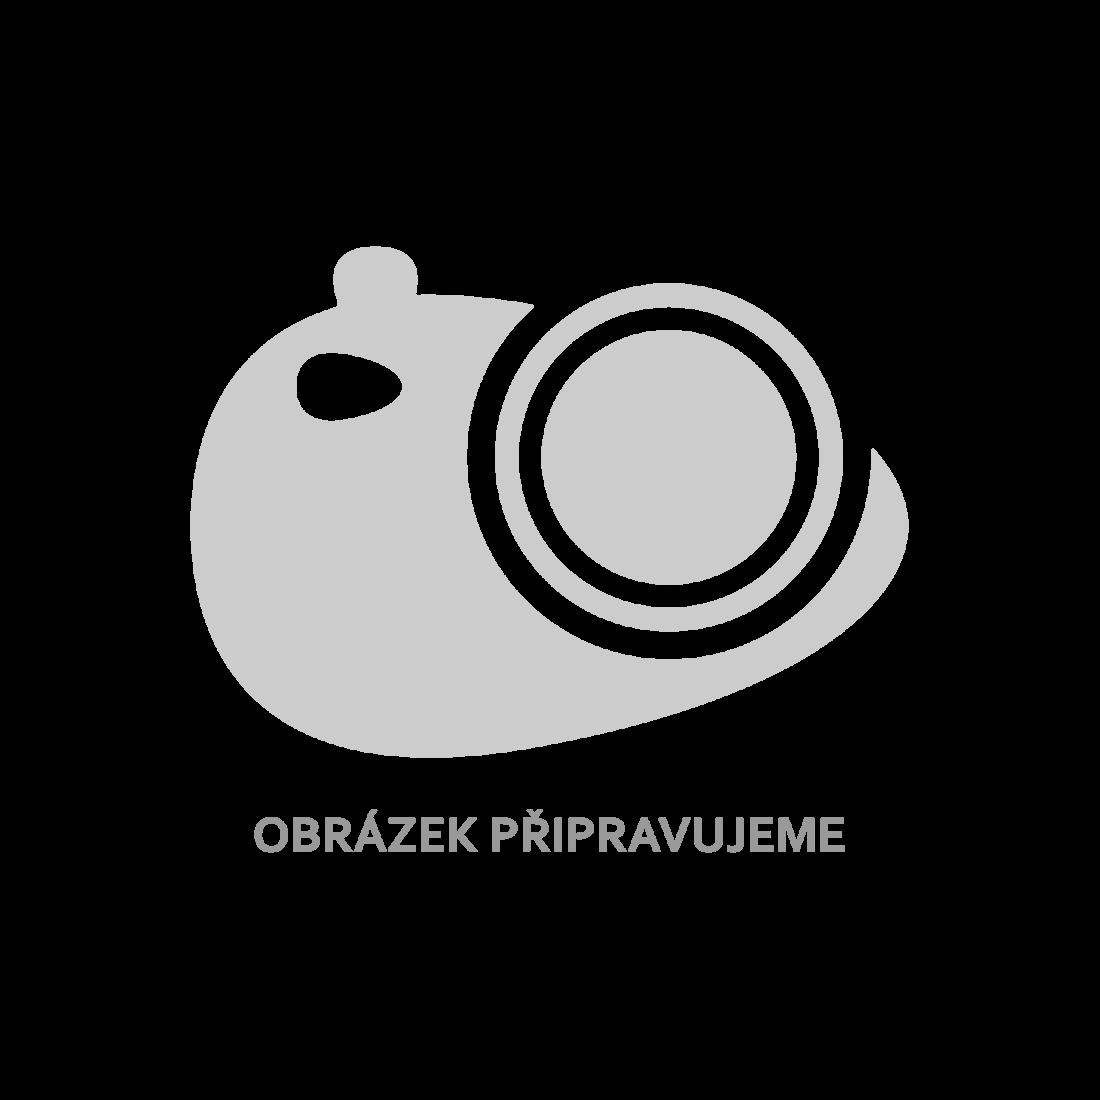 vidaXL Barové židle 2 ks hnědé pravá kůže [246375]